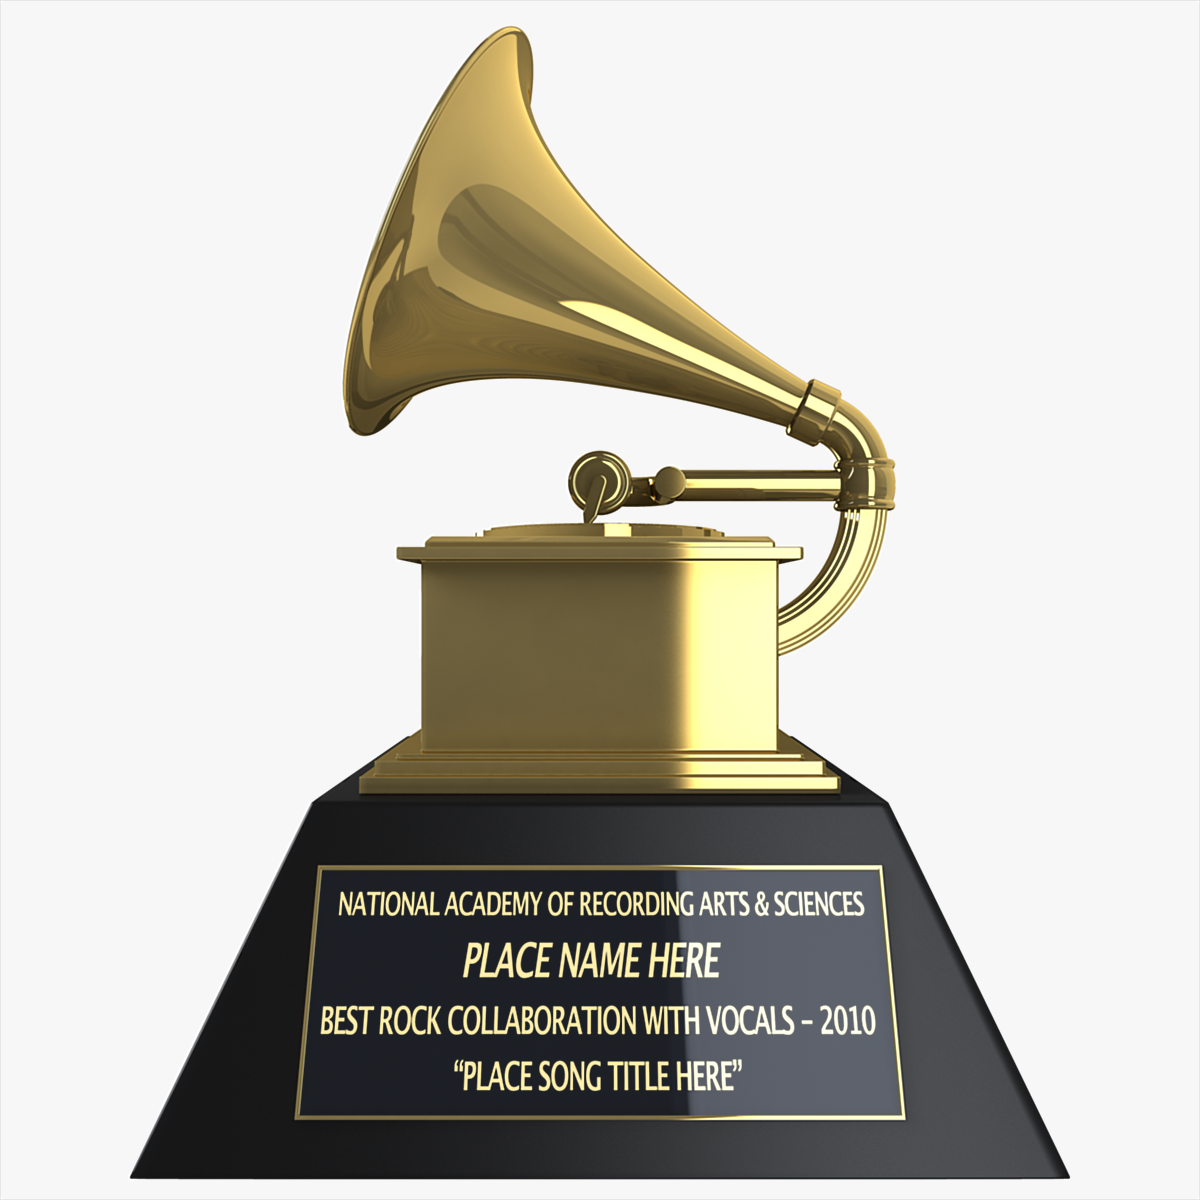 Grammy Award 3D Model max obj 3ds c4d lwo lw lws  : grammyaward3dmodel3dsc4dlwolwlwsmambobjmaxf8436822 a1b1 4e8b 95c6 aa6cc5ab46d7 from www.cgtrader.com size 1200 x 1200 png 536kB